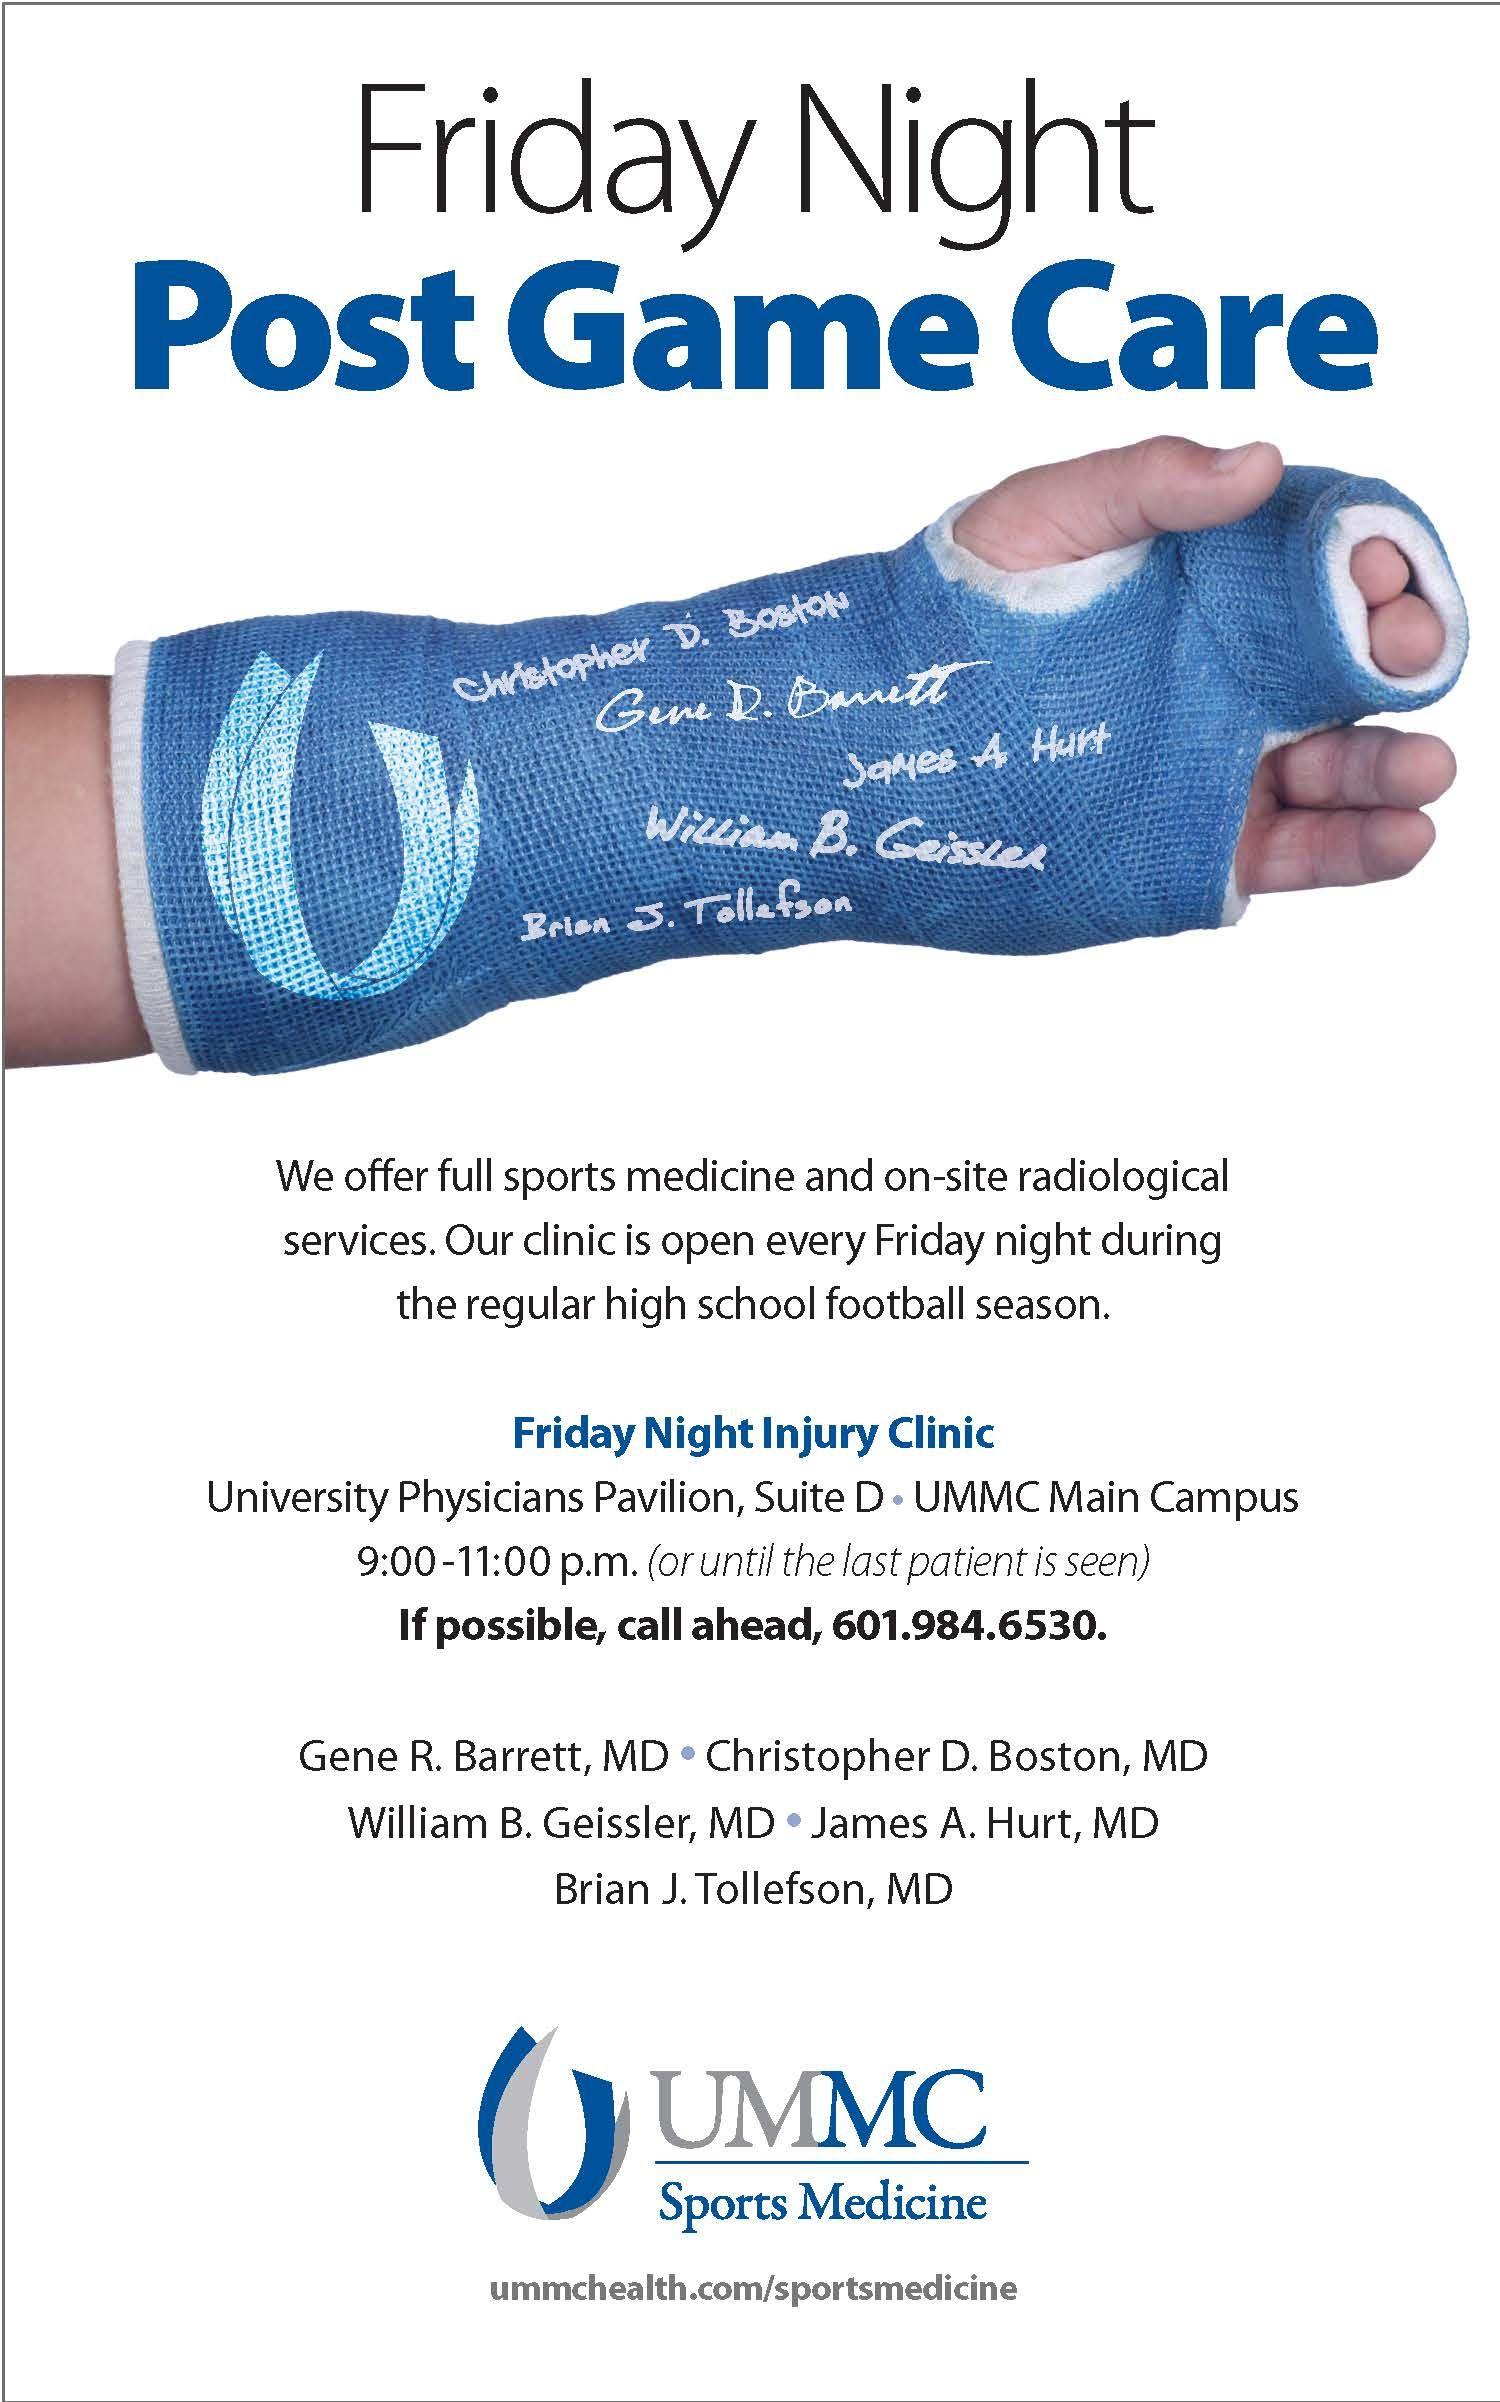 UMMC Sports Medicine Friday Night Injury Clinic print ad